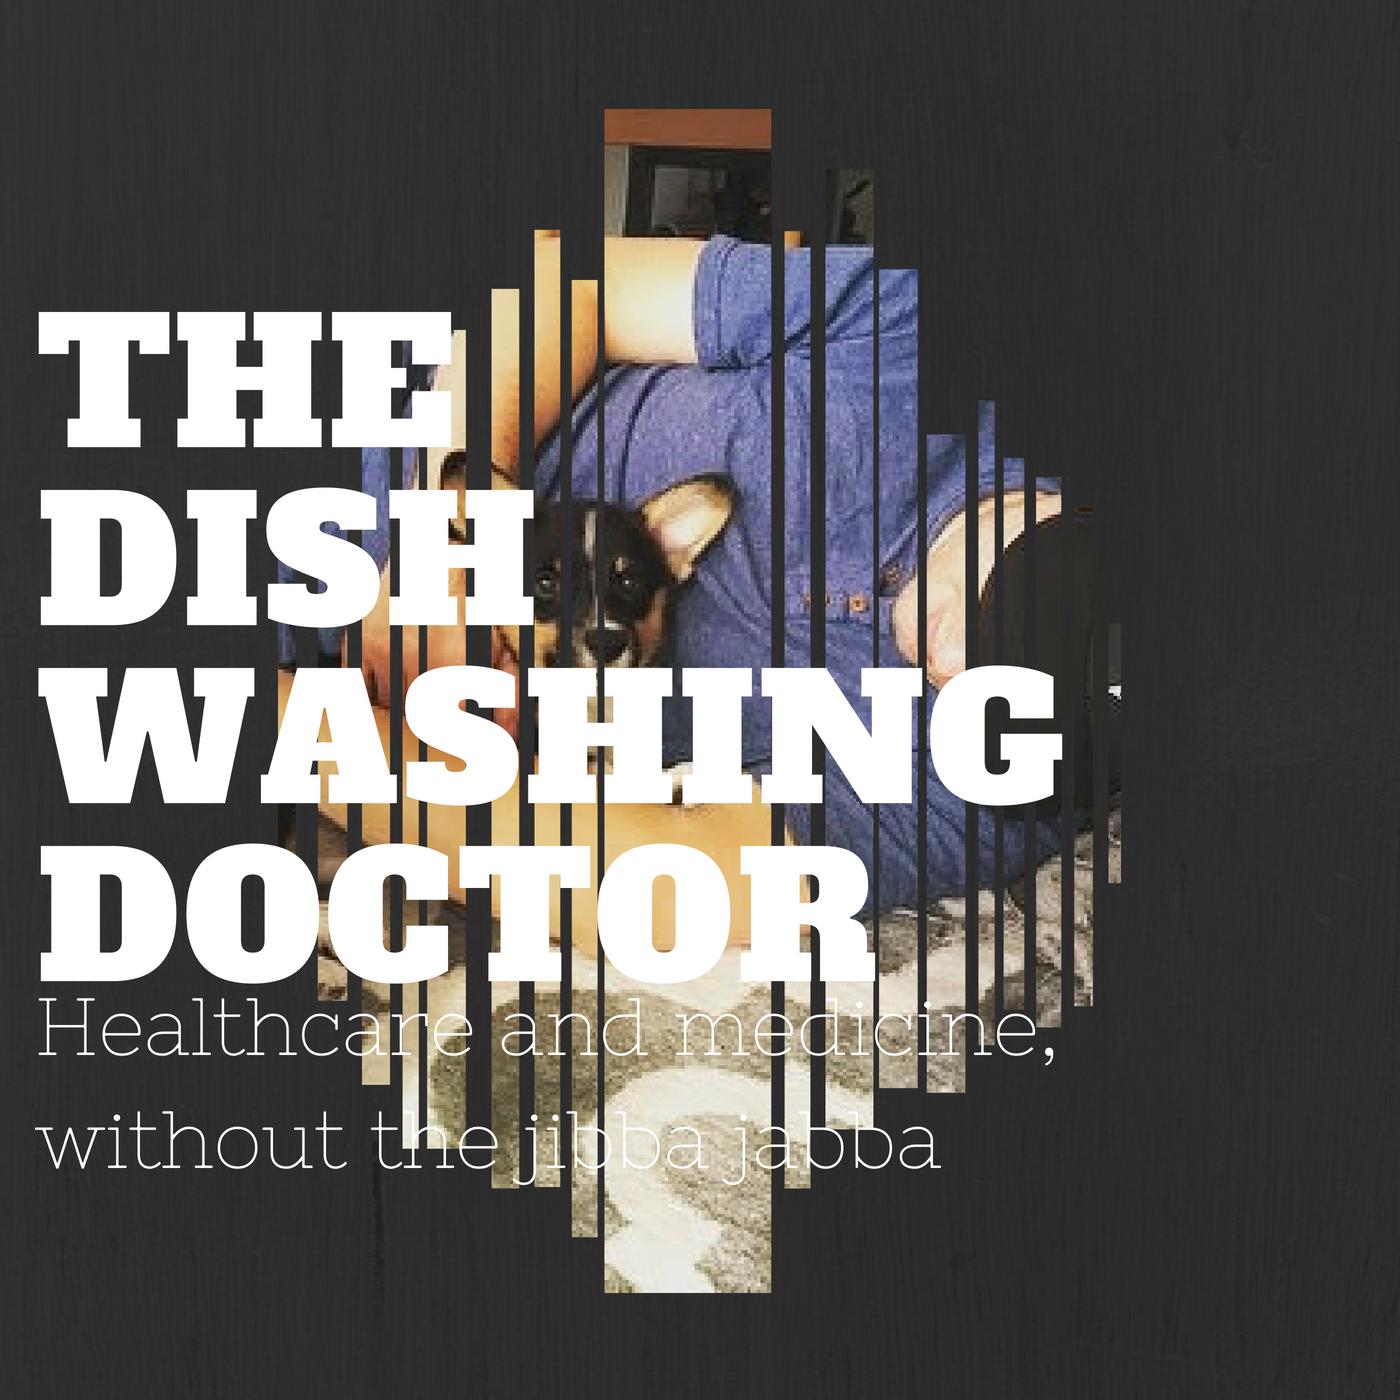 The dishwashing doctor show art